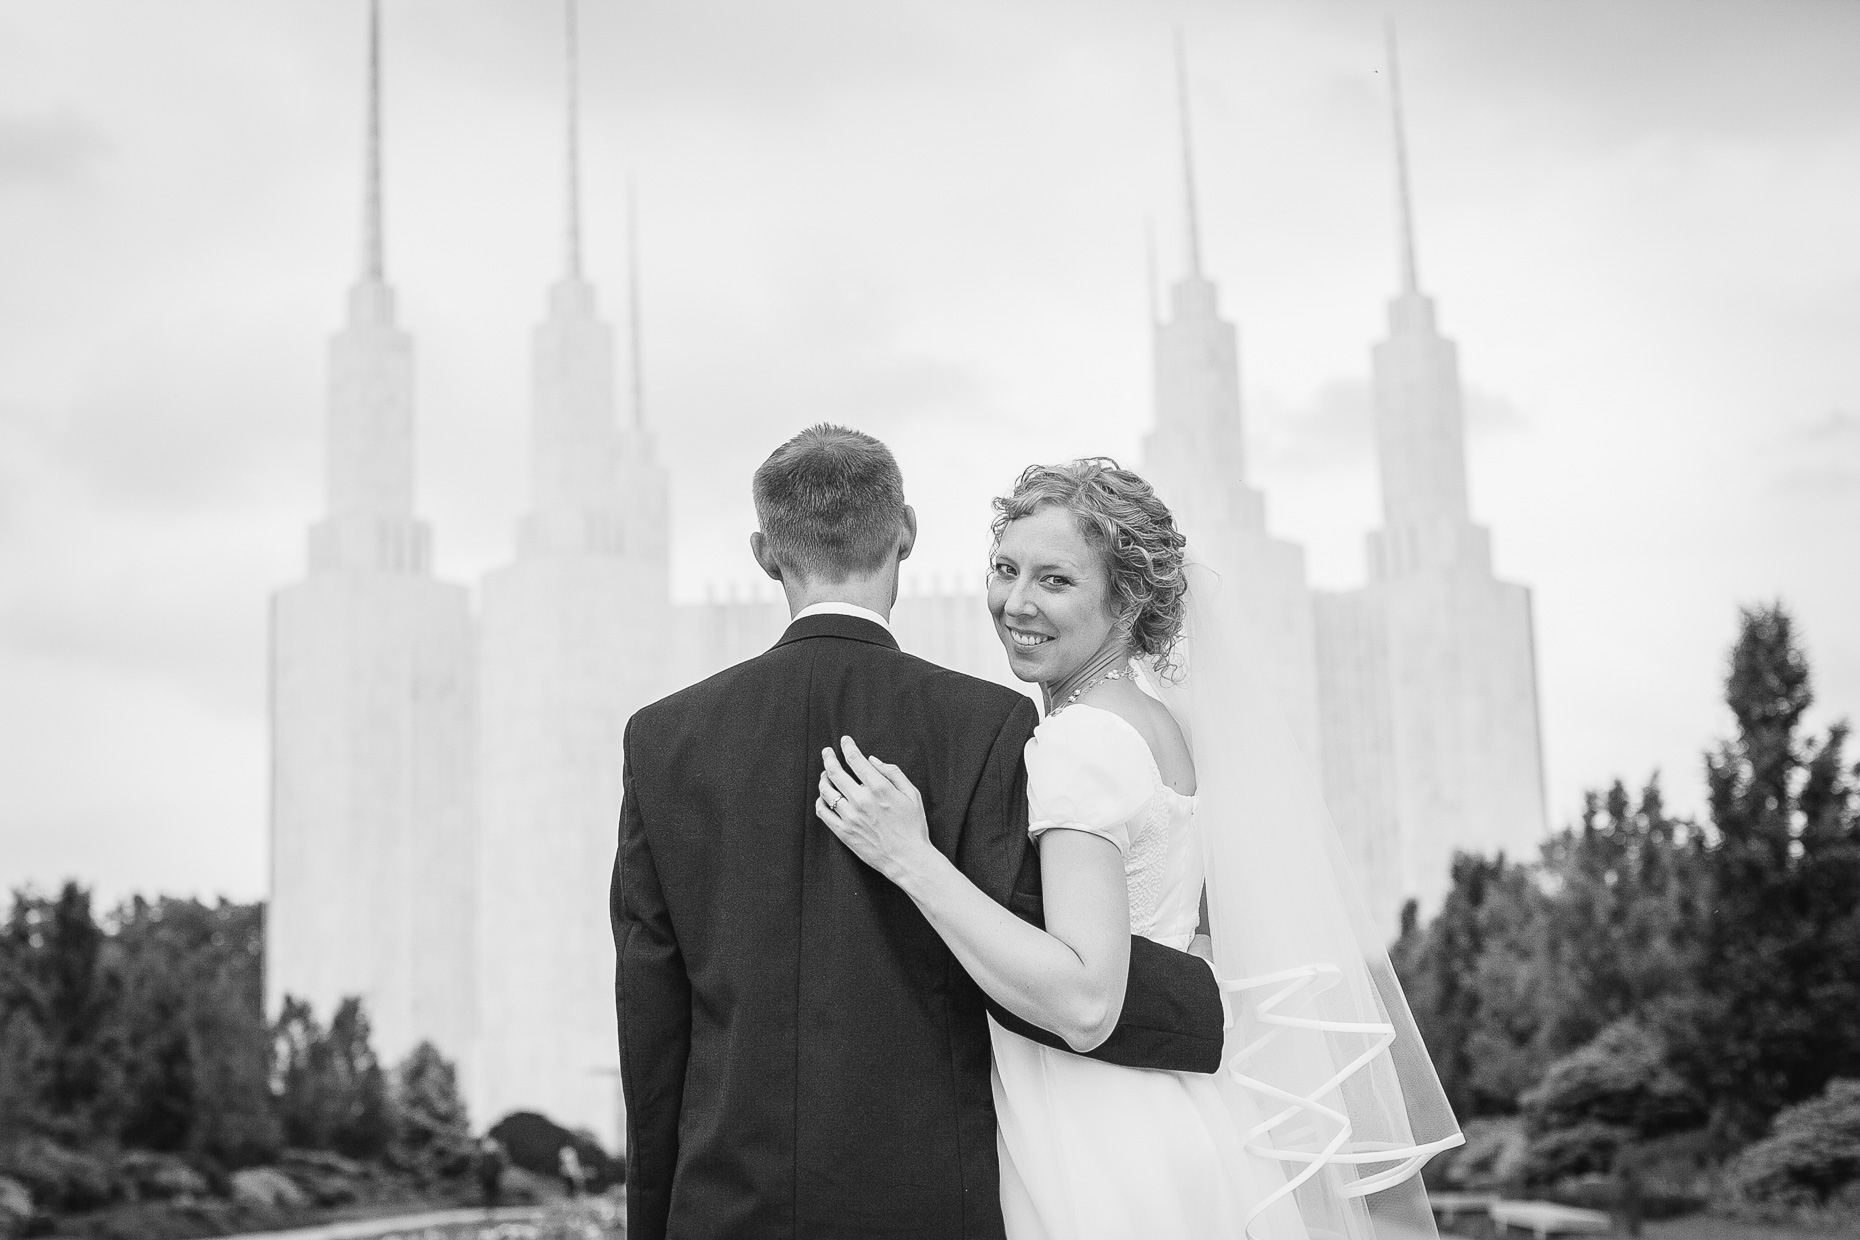 Weddings by Elliott O'Donovan - Washington DC_-14.jpg